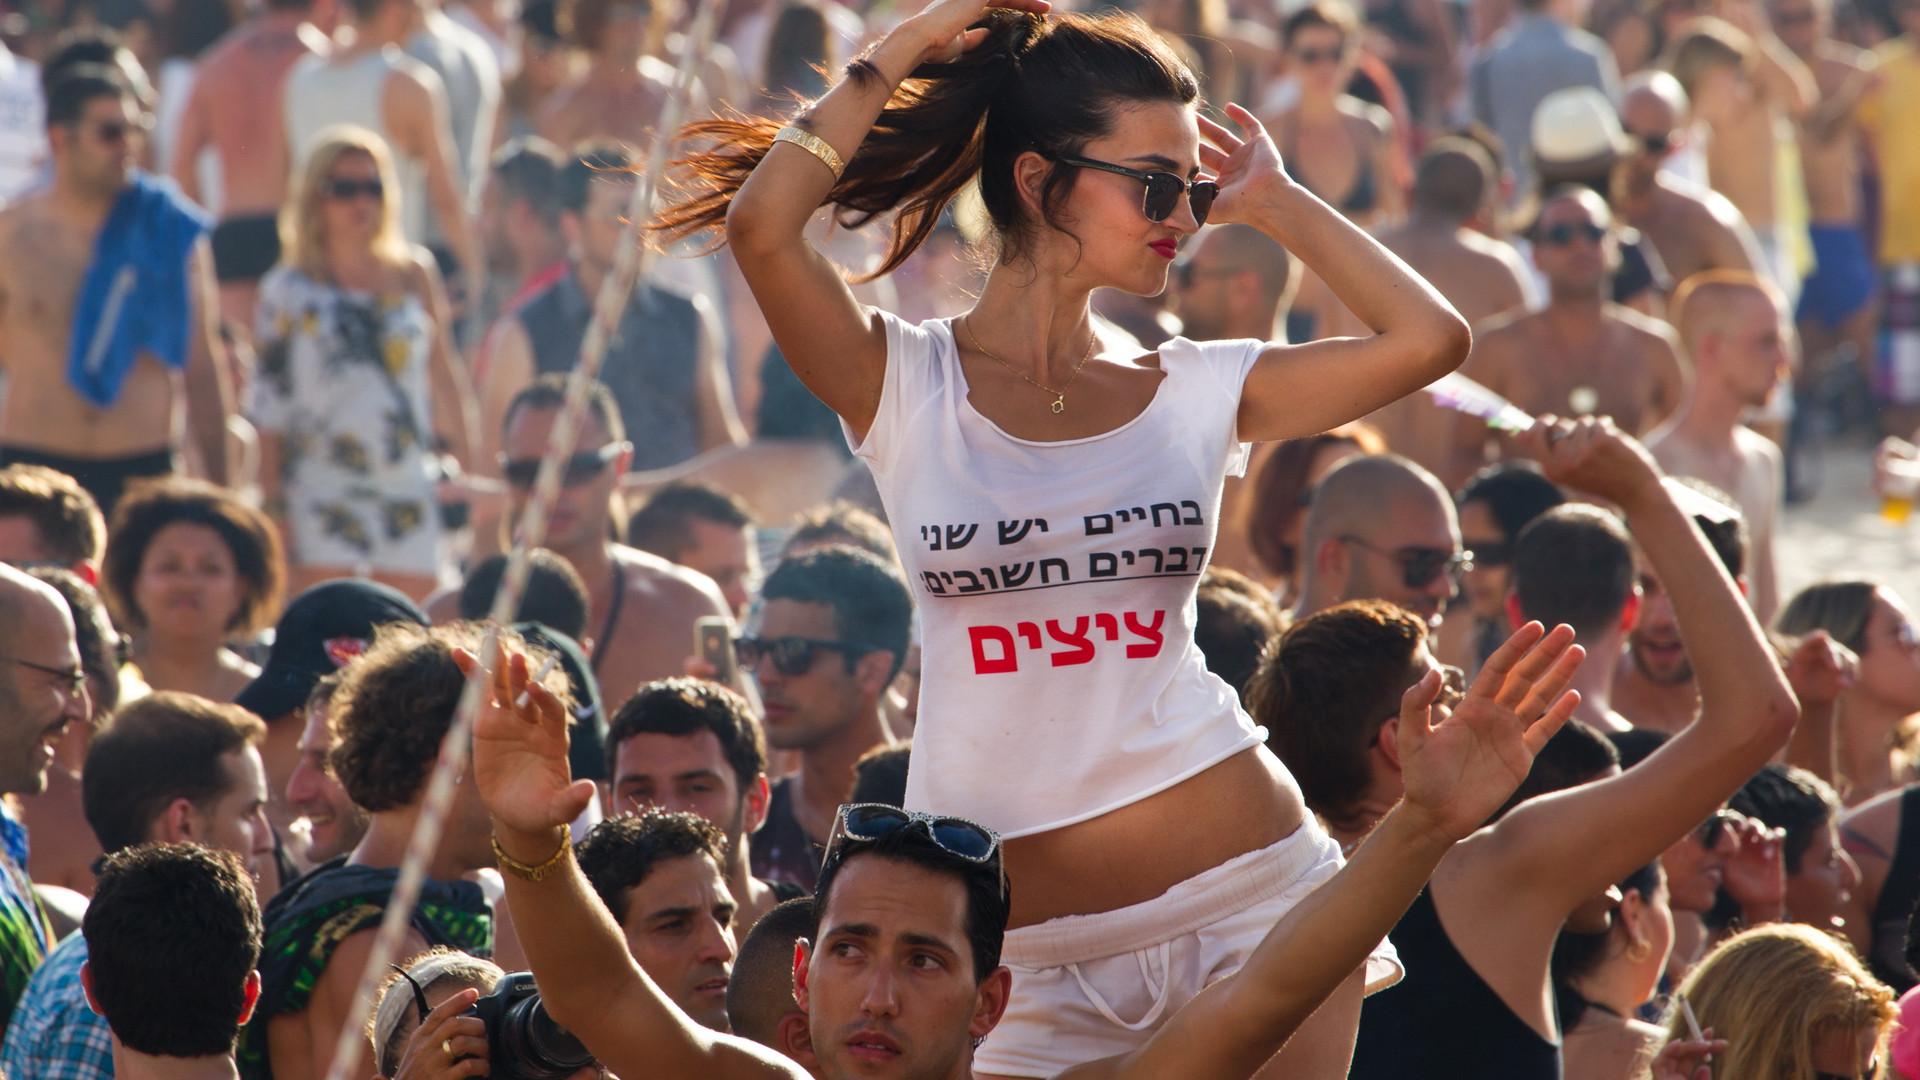 70 Faces Print #7 - Tel Aviv, Israel June. 2011